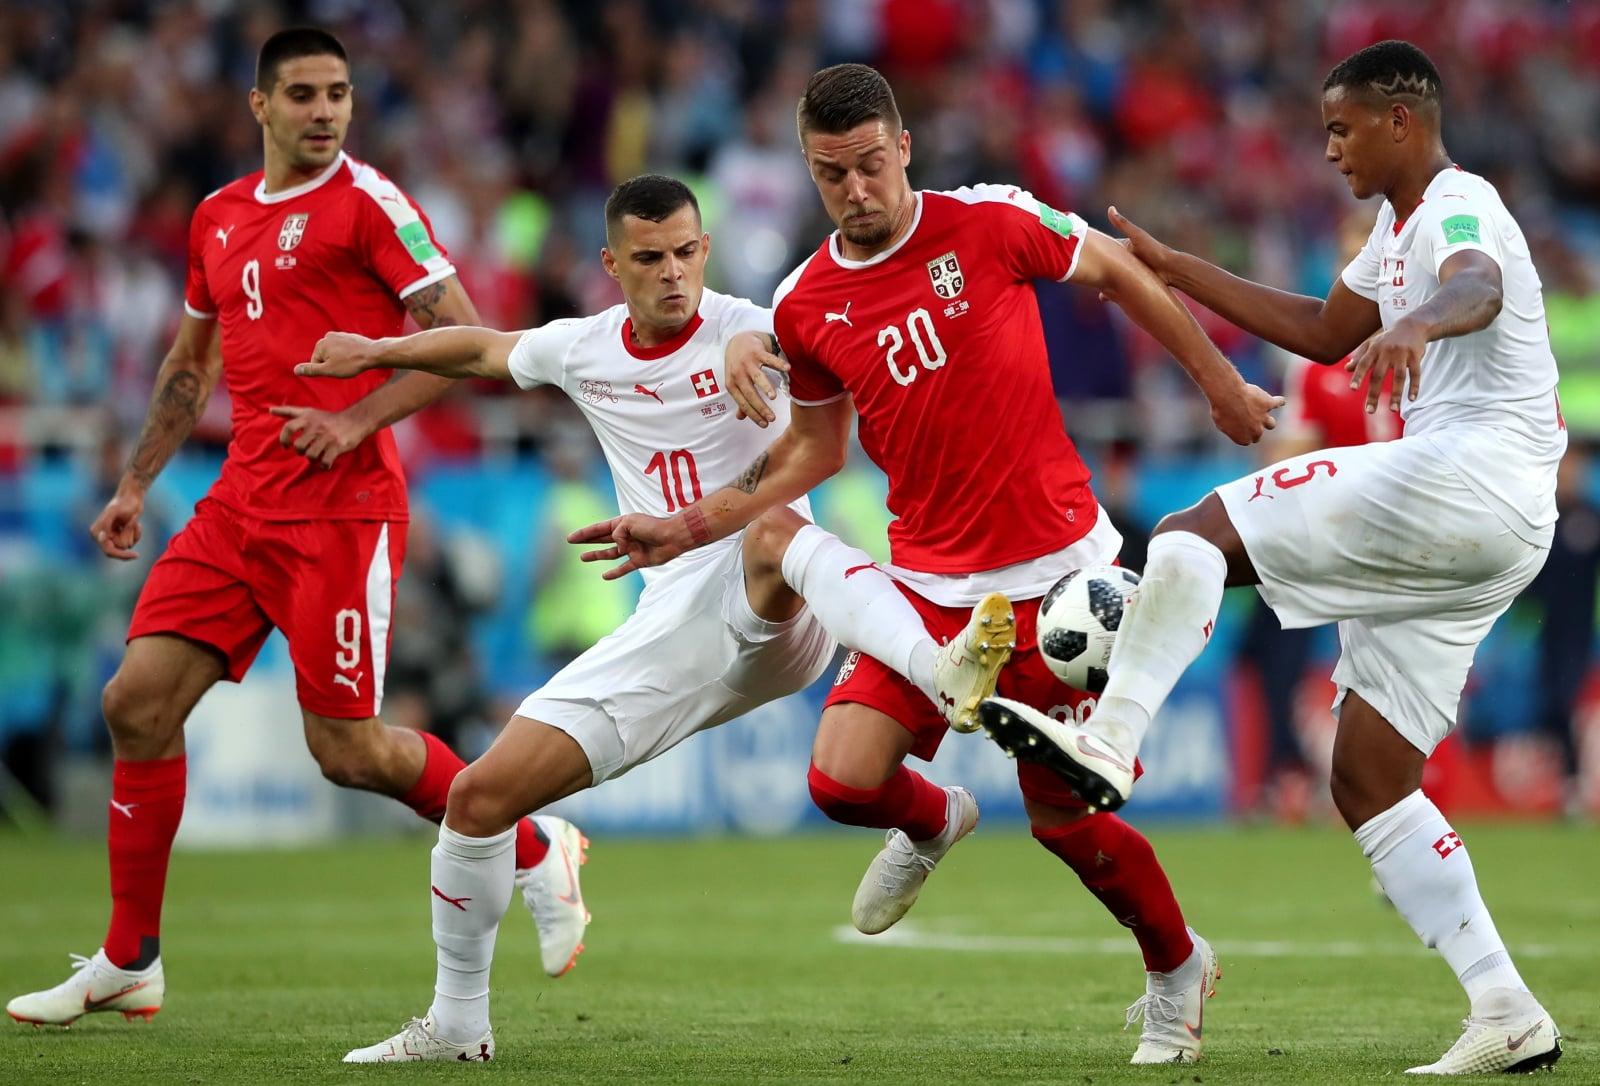 Mecz Serbia vs Szwajcaria. fot. EPA/MARTIN DIVISEK